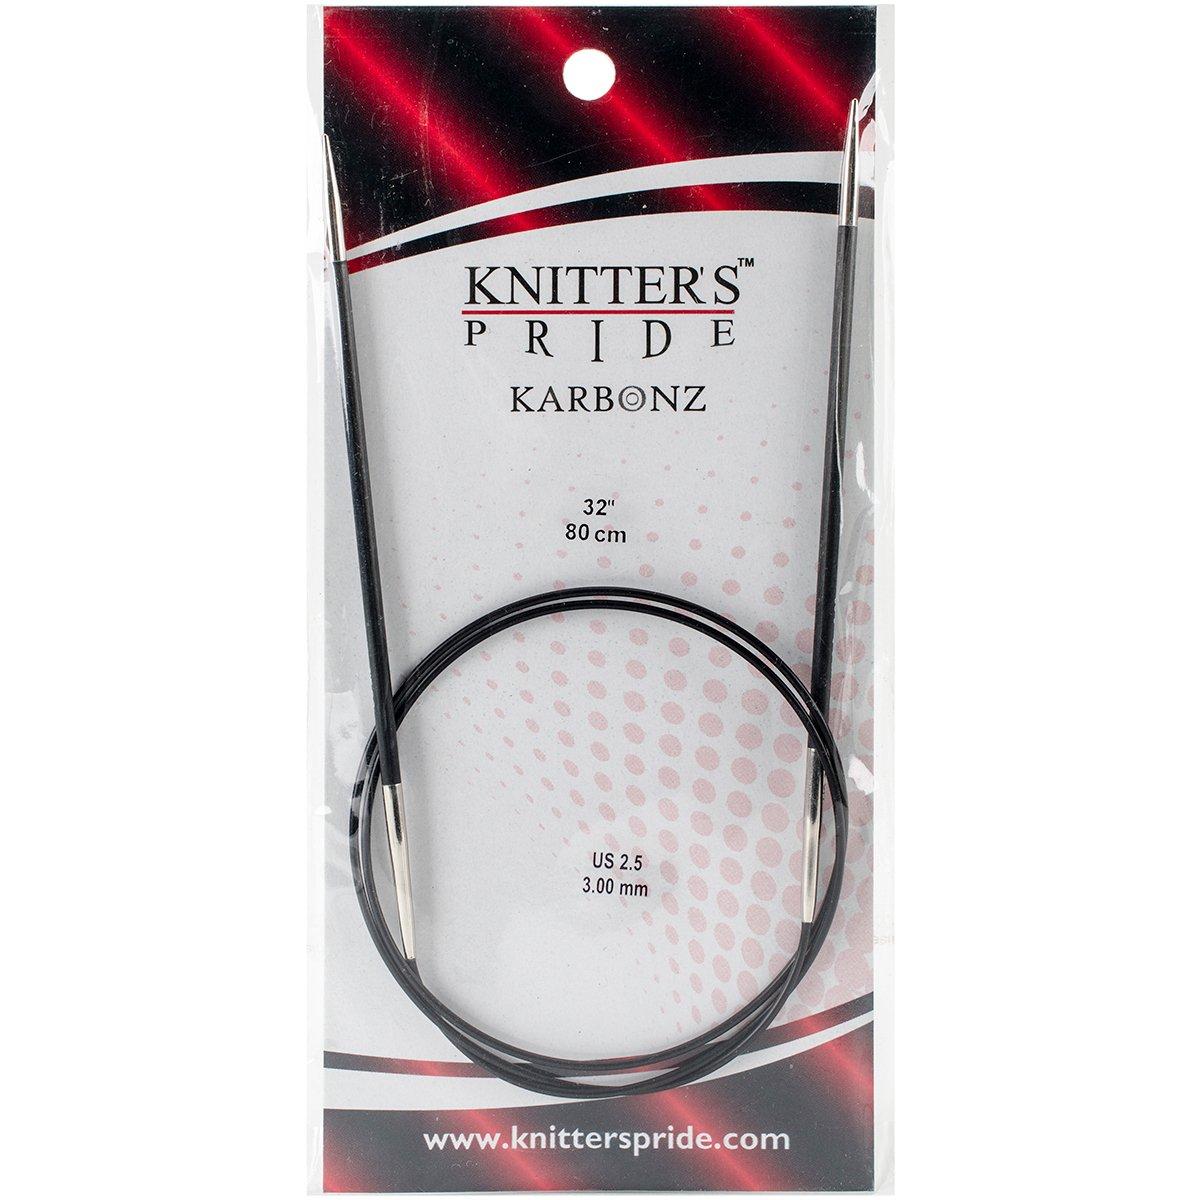 Knitting Needles; Size US 5 110228 Knitters Pride Karbonz Circular 32-inch 80cm 3.75mm